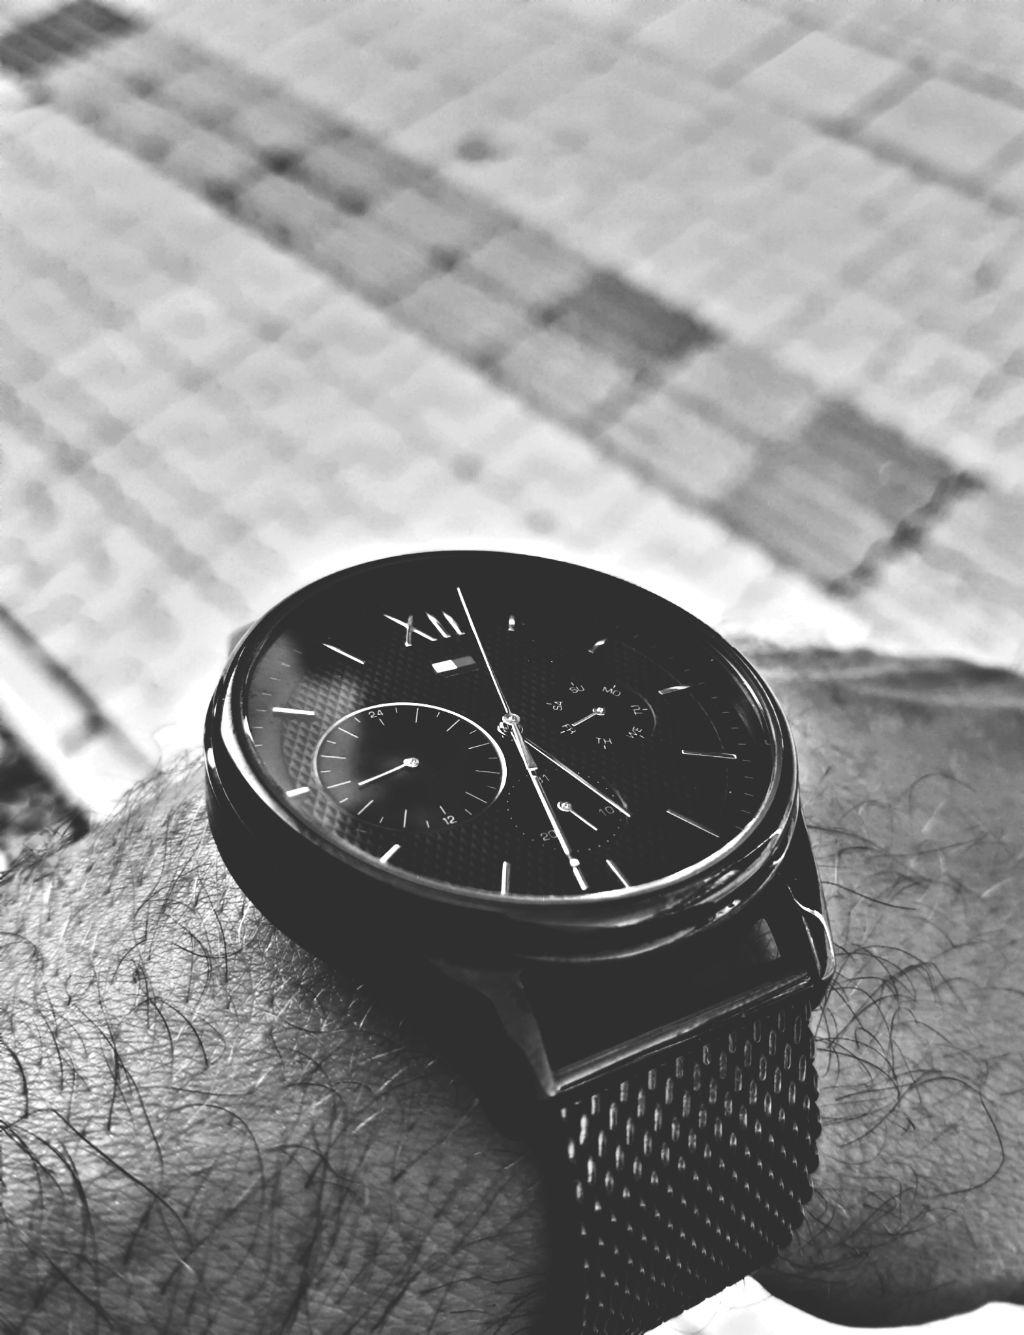 #watch #time #blackandwhite